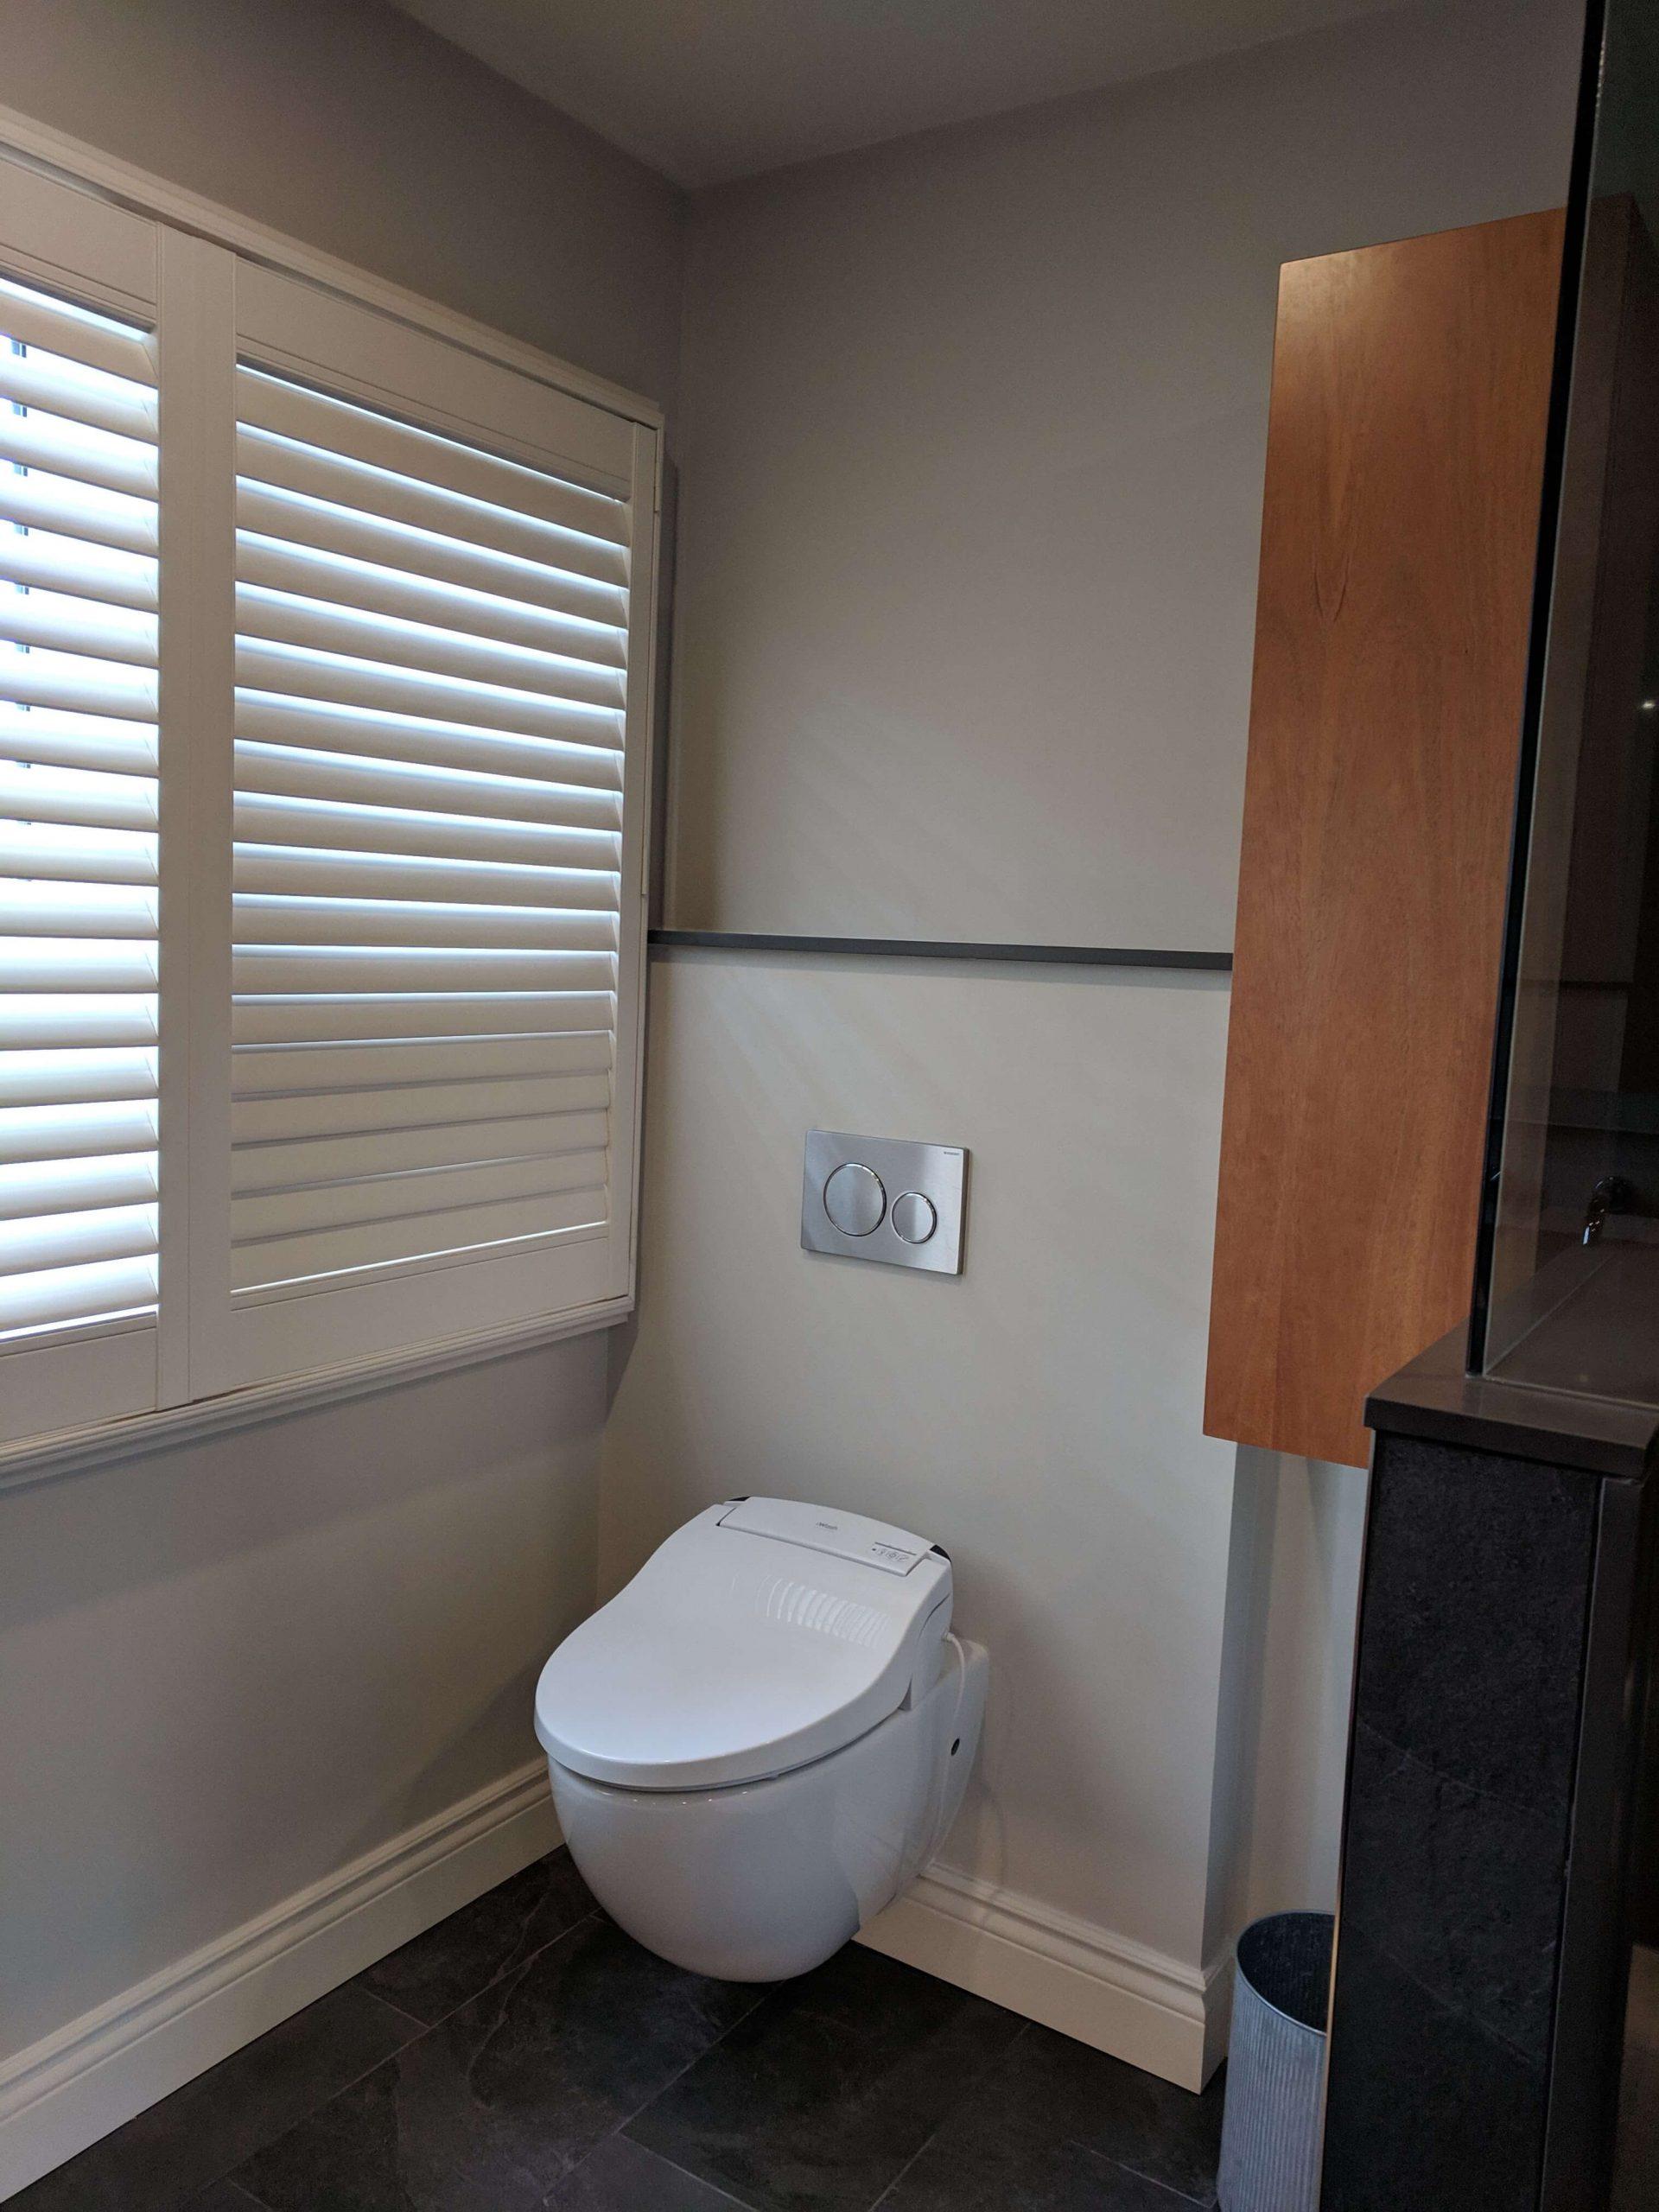 durham bathroom renovation and toilet installation